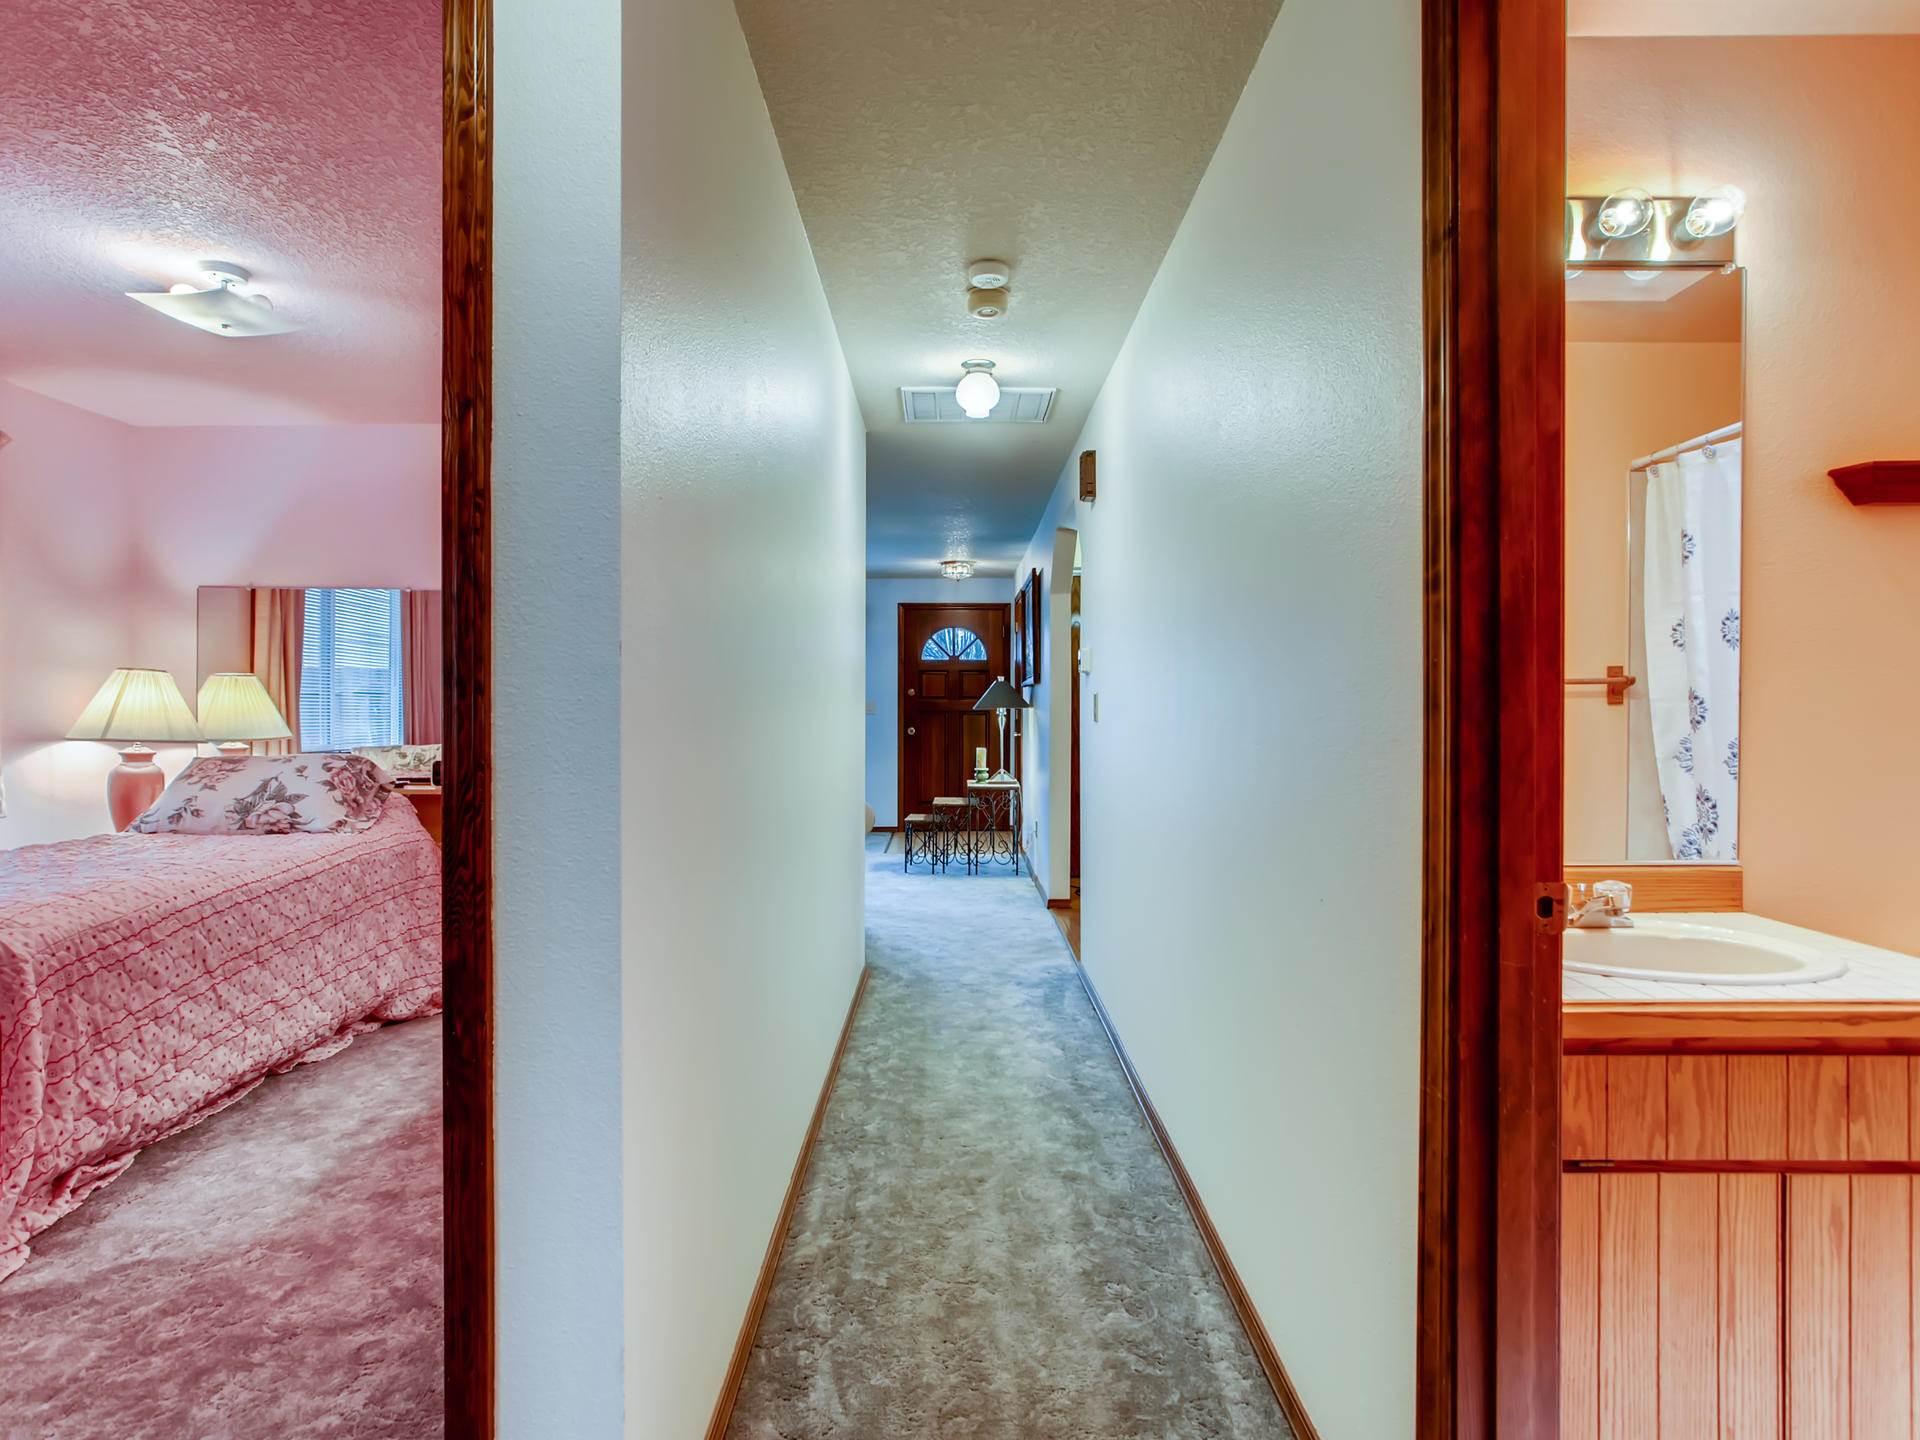 16800 SE Berghammer St, Milwaukie, OR 97267